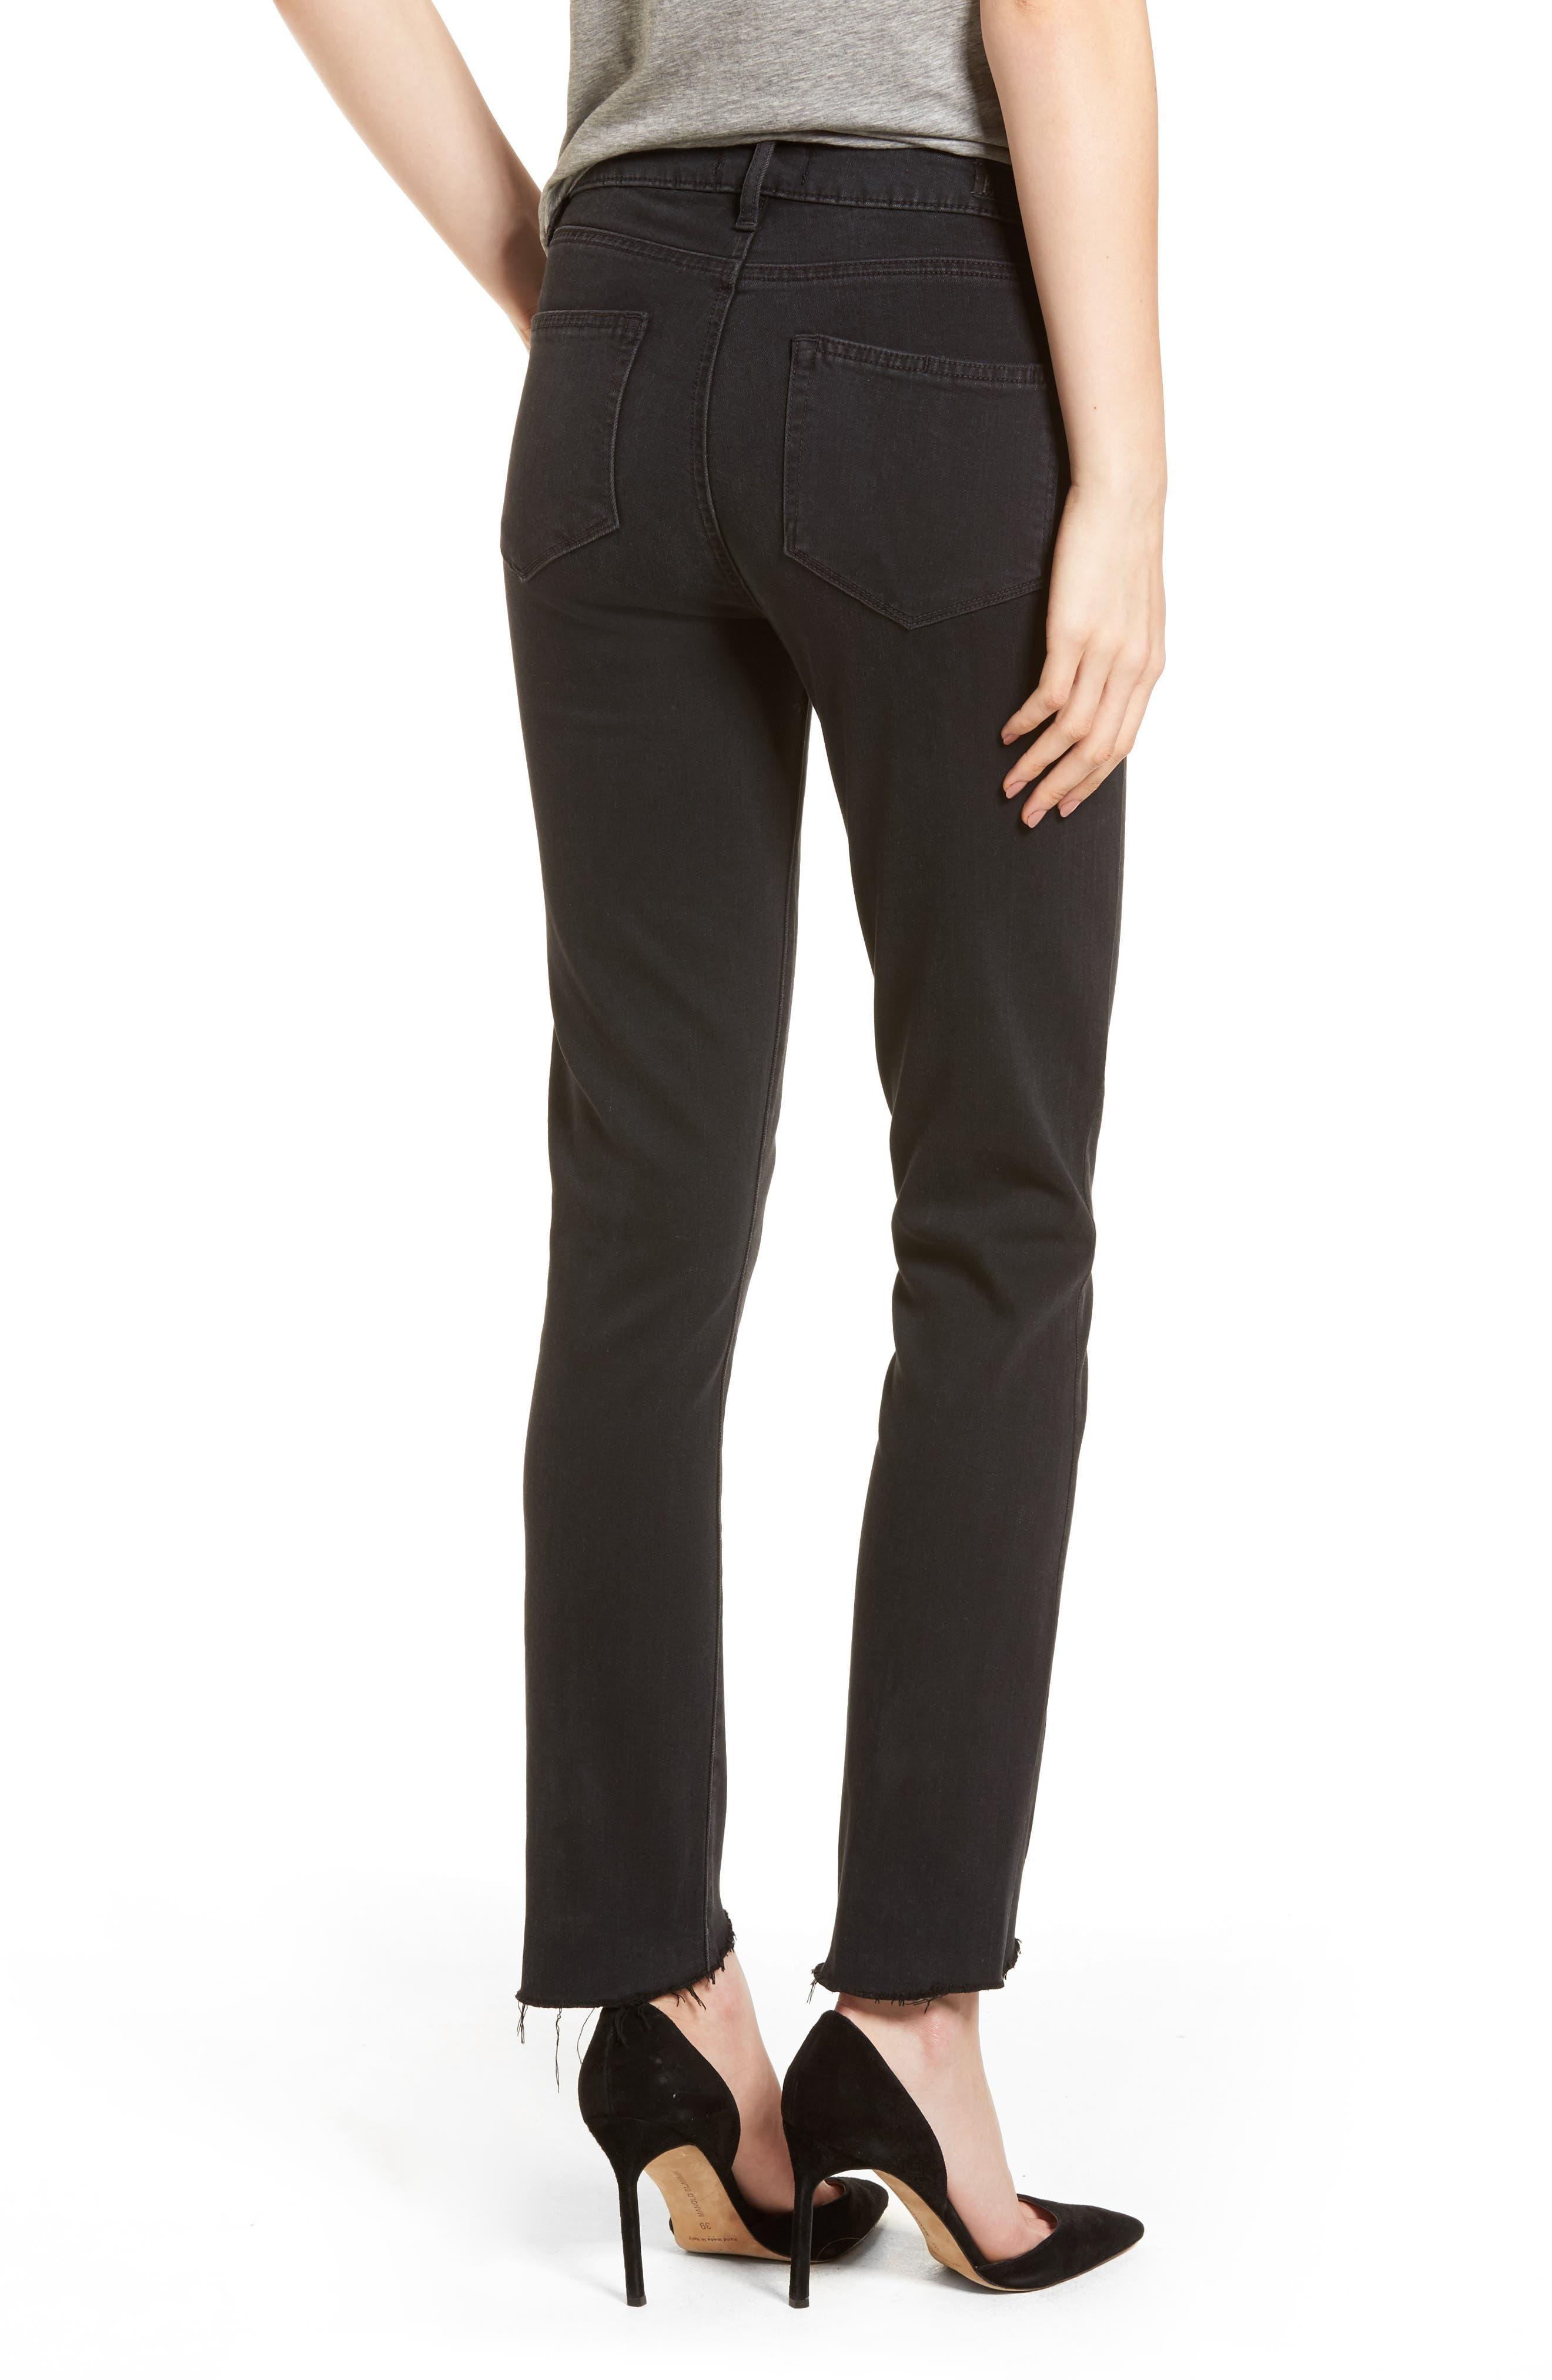 Transcend - Hoxton High Waist Ultra Skinny Jeans,                             Alternate thumbnail 2, color,                             Black Fog